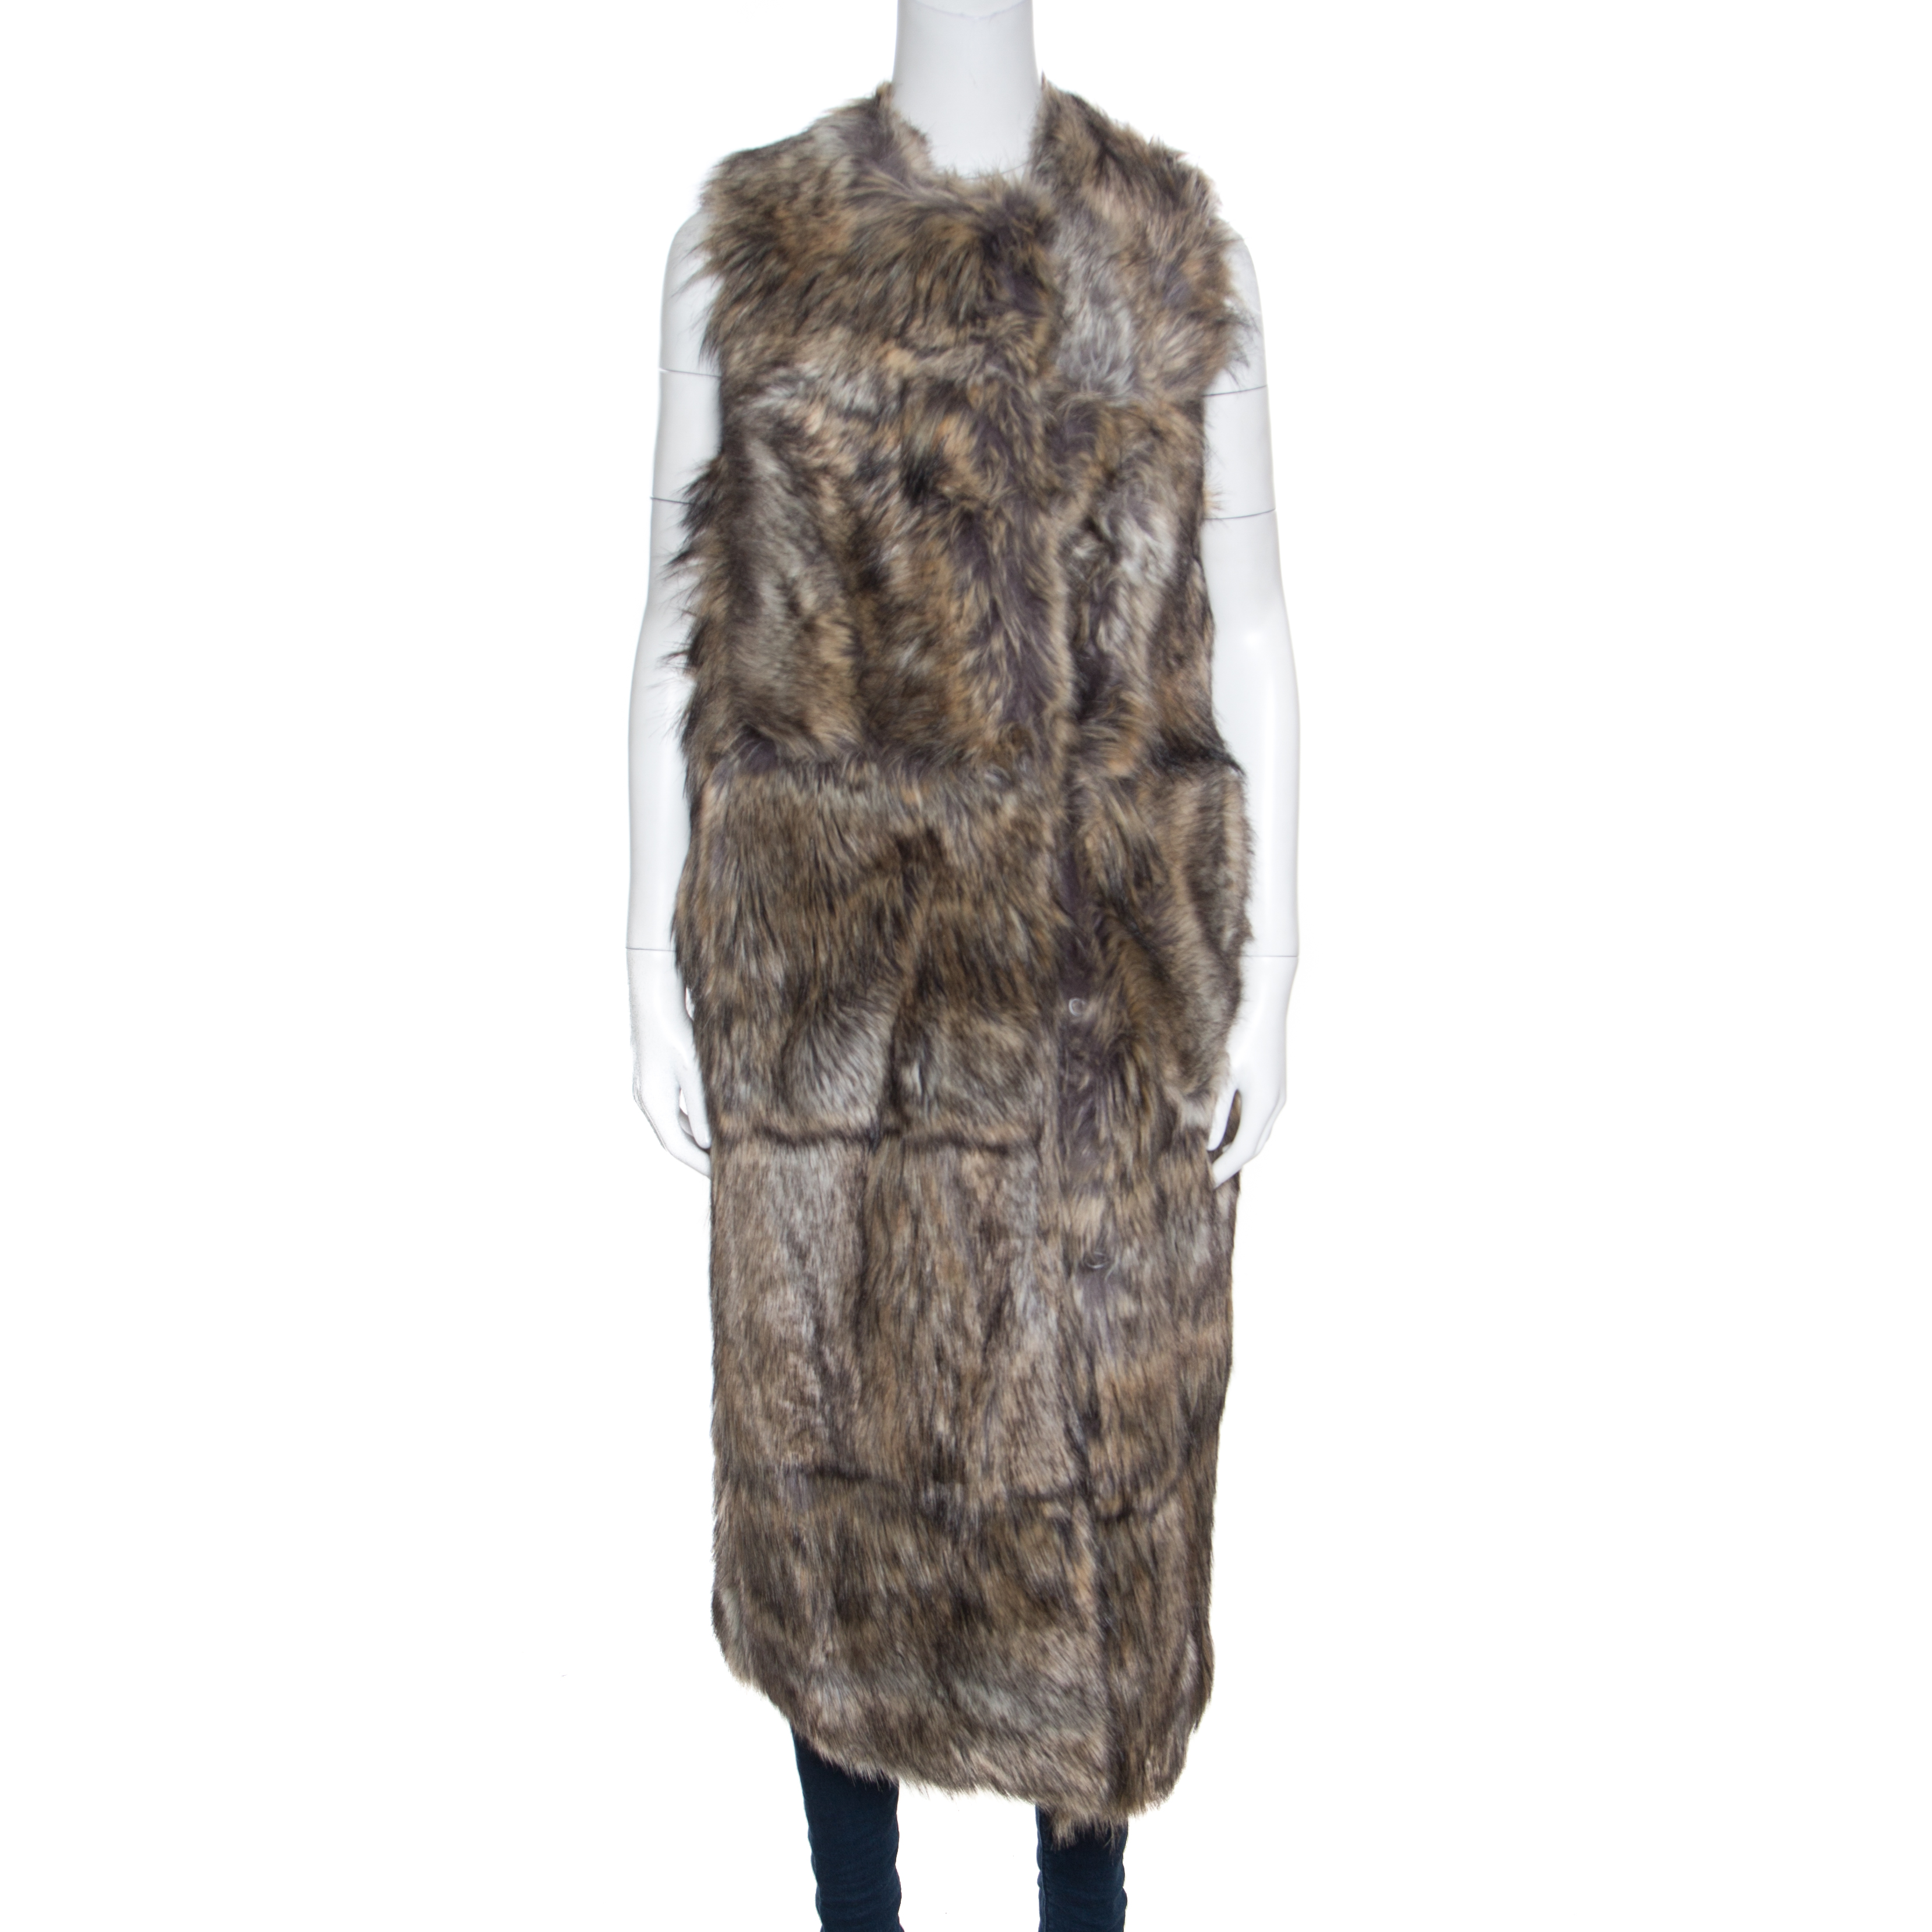 Купить со скидкой Stella McCartney Brown and Beige Faux Fur Adalia Long Sleeveless Coat XS